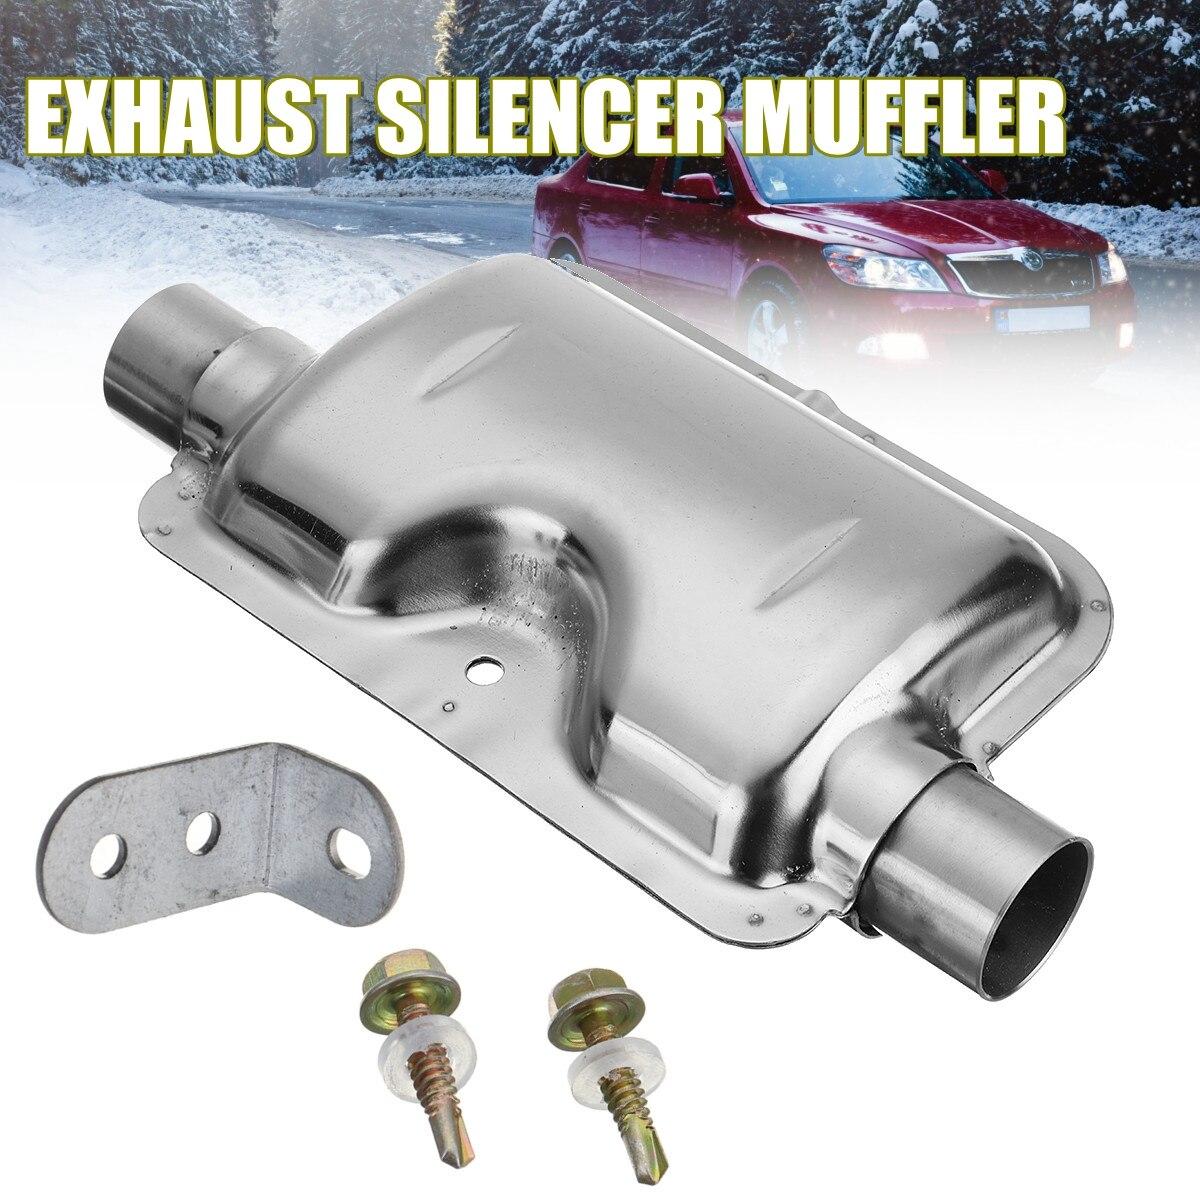 24mm/ 0.9inch Portable Silver Car Exhaust Silencer Muffler for Webasto Eberspacher Heater high quality intake silencer and exhaust muffler for air parking heater